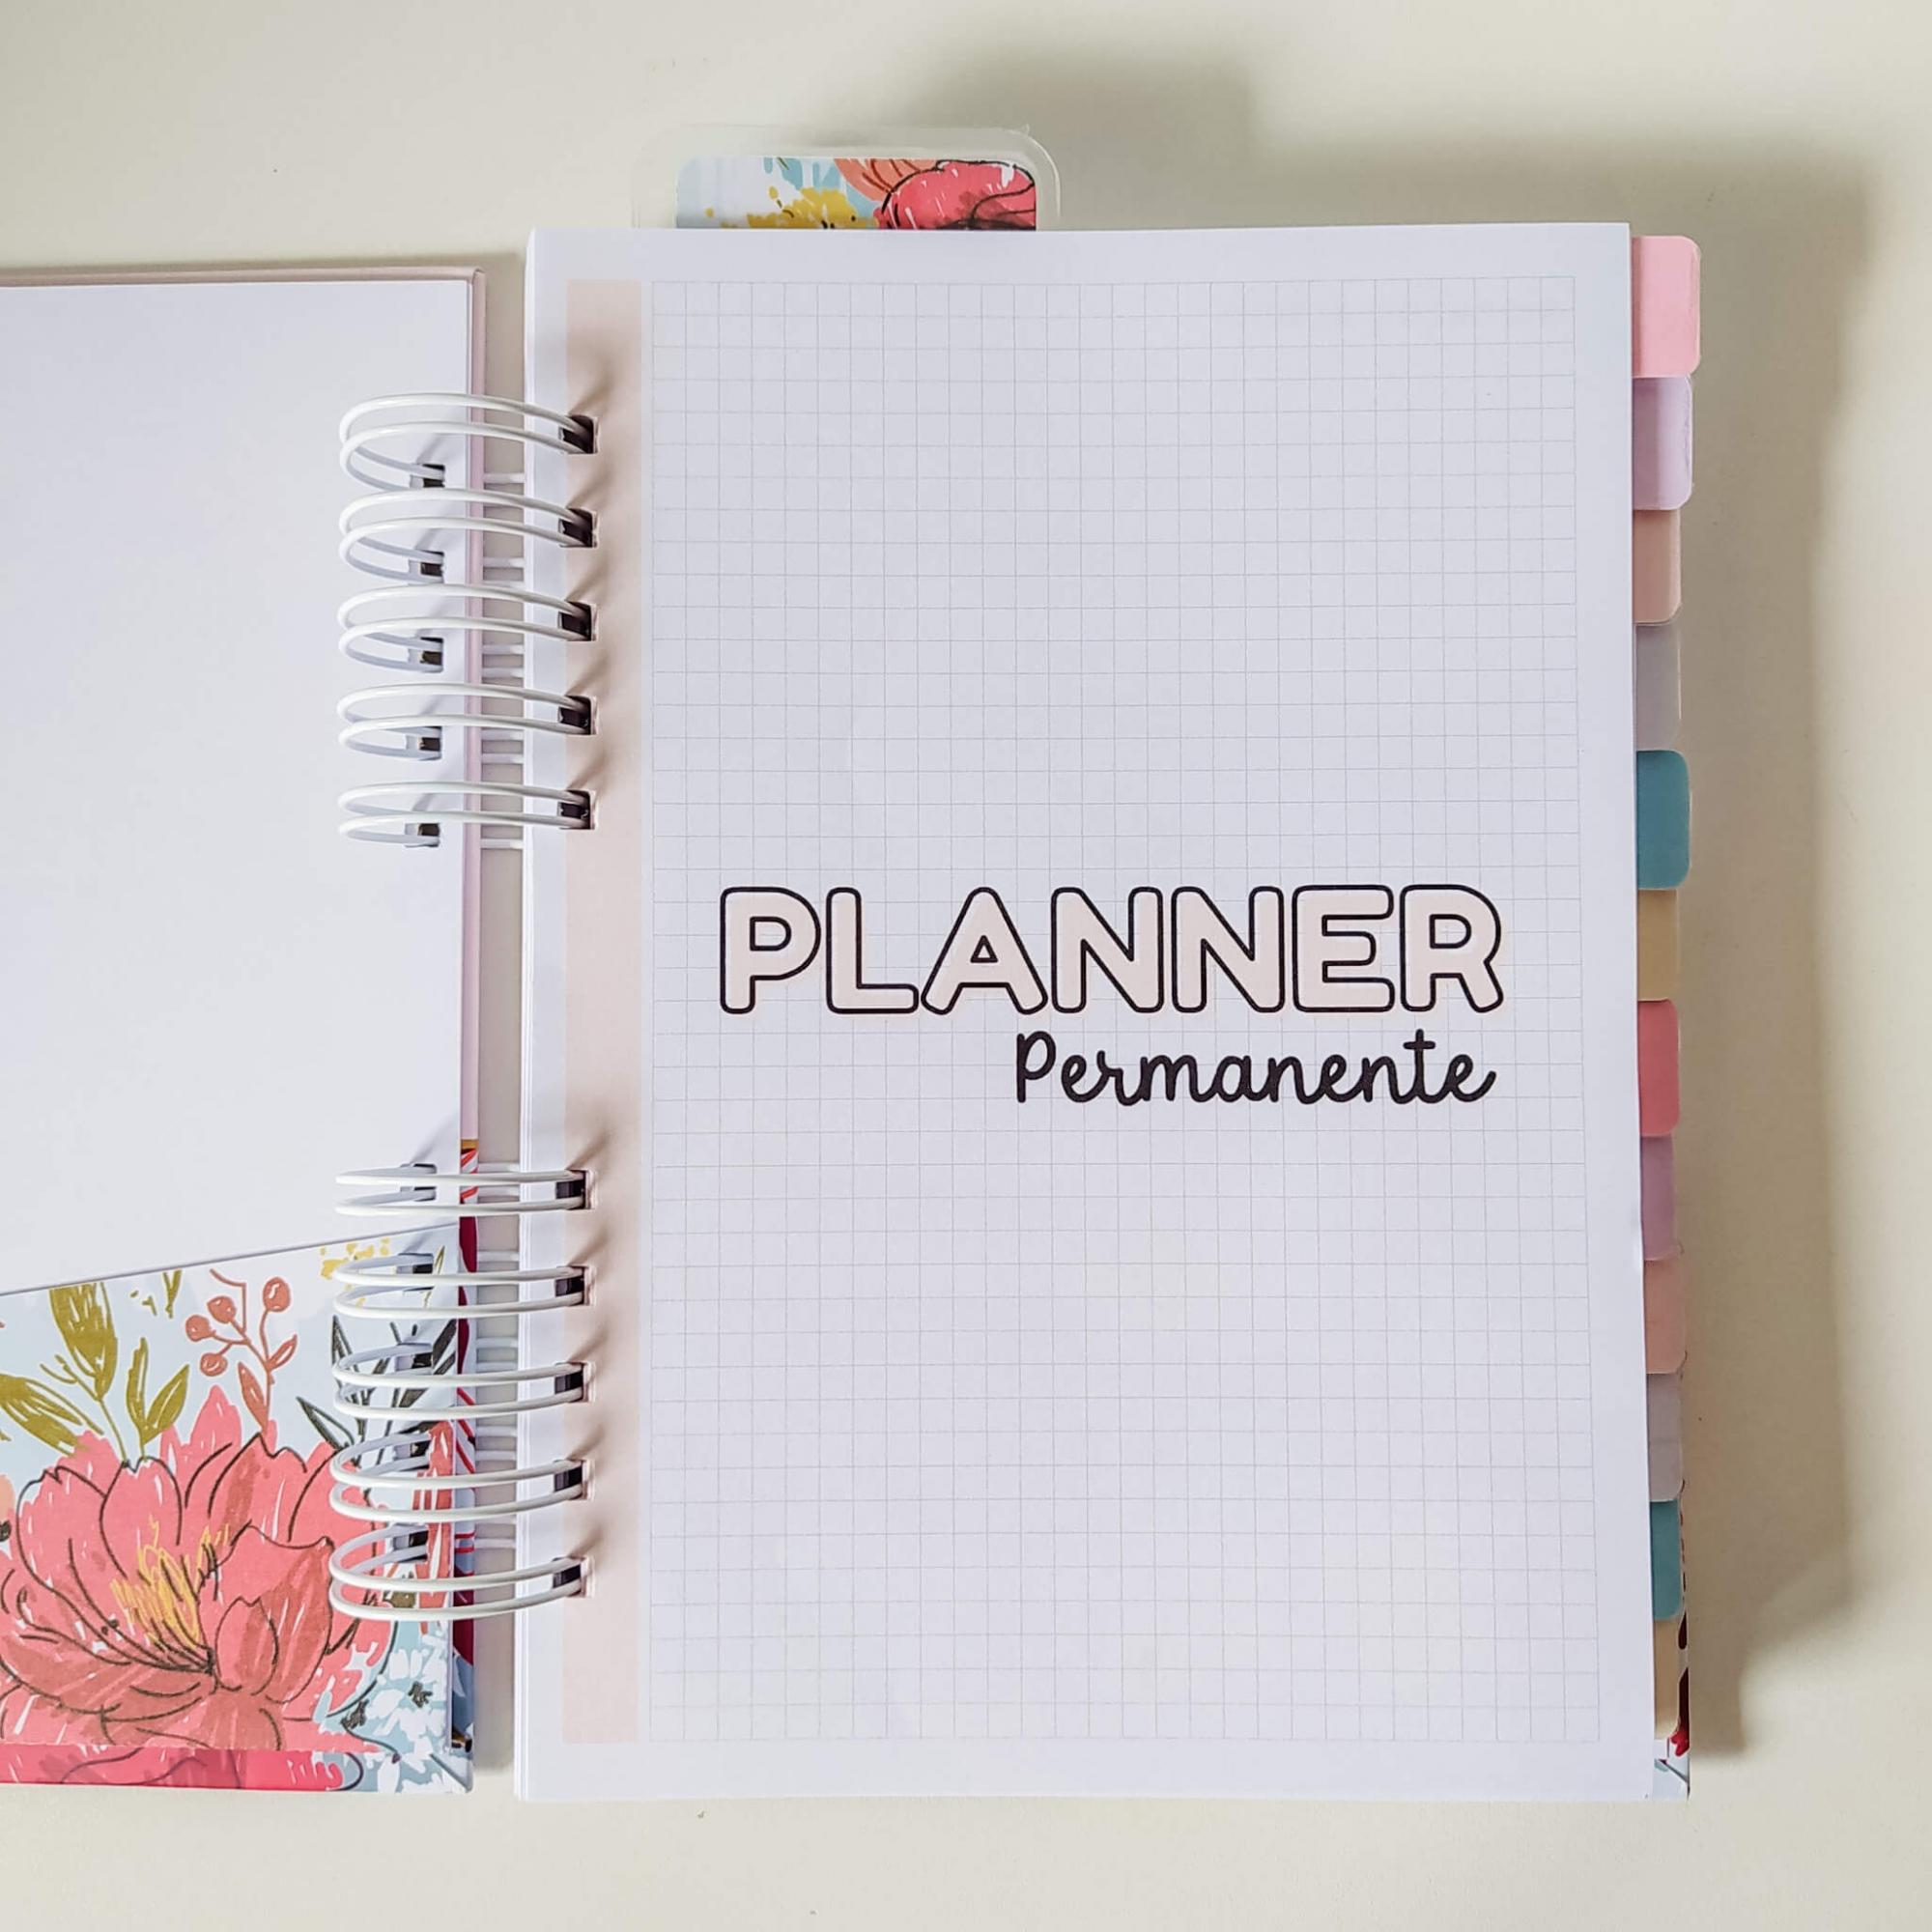 Planner permanente - Geometrica/Abstrata